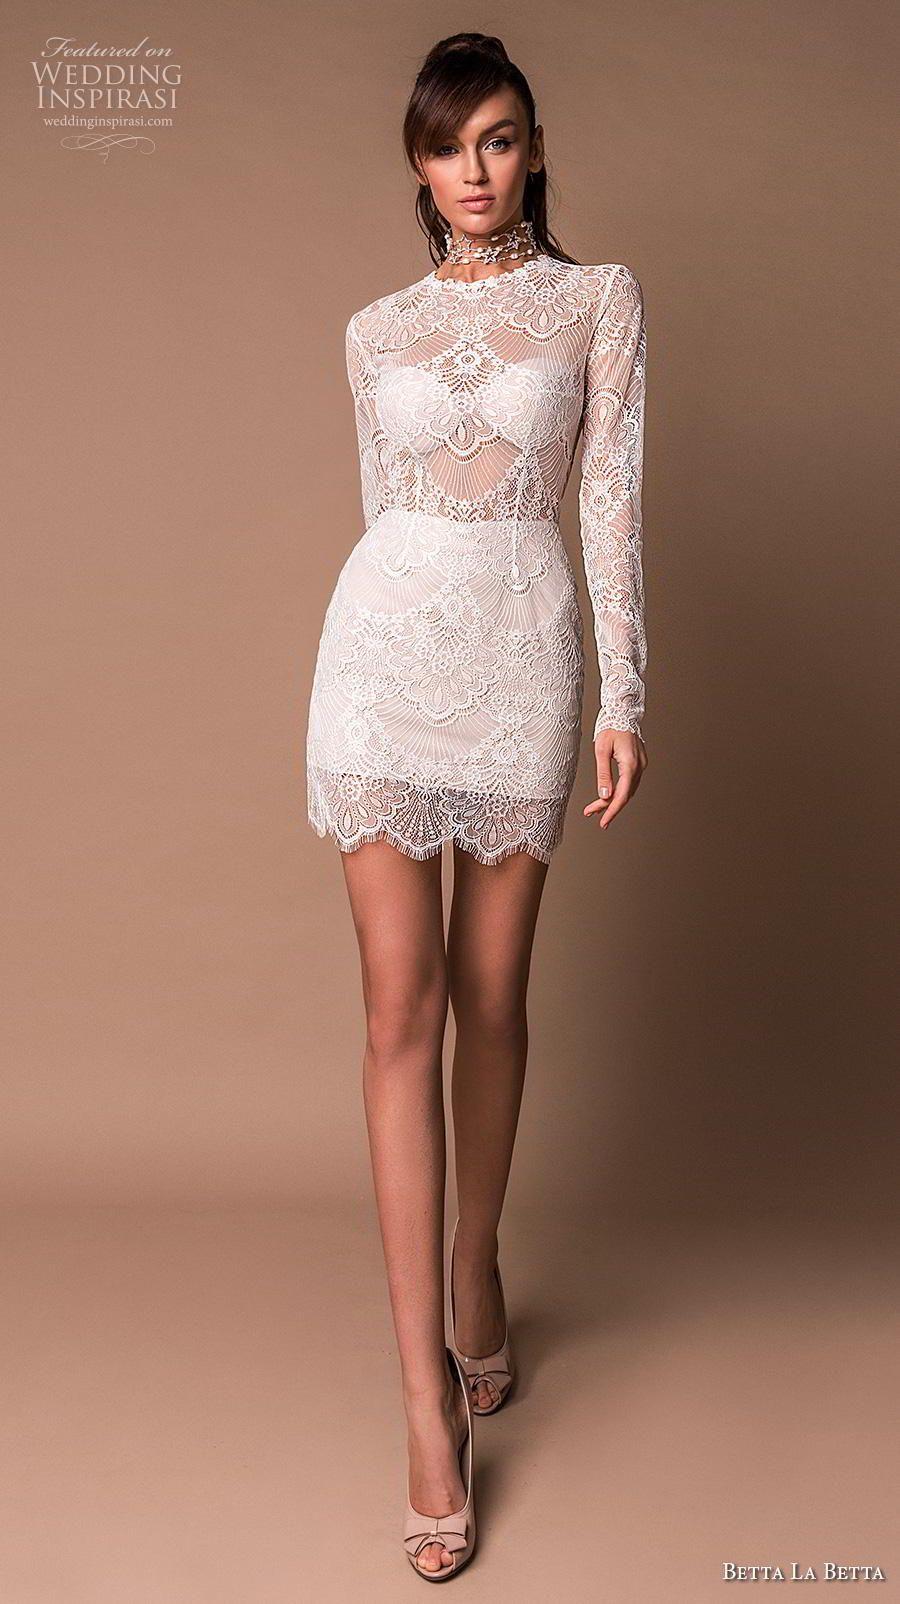 Betta La Betta 2020 Wedding Dresses Primavera Bridal Collection Wedding Inspirasi Short Wedding Dress Mini Wedding Dresses Civil Wedding Dresses [ 1604 x 900 Pixel ]